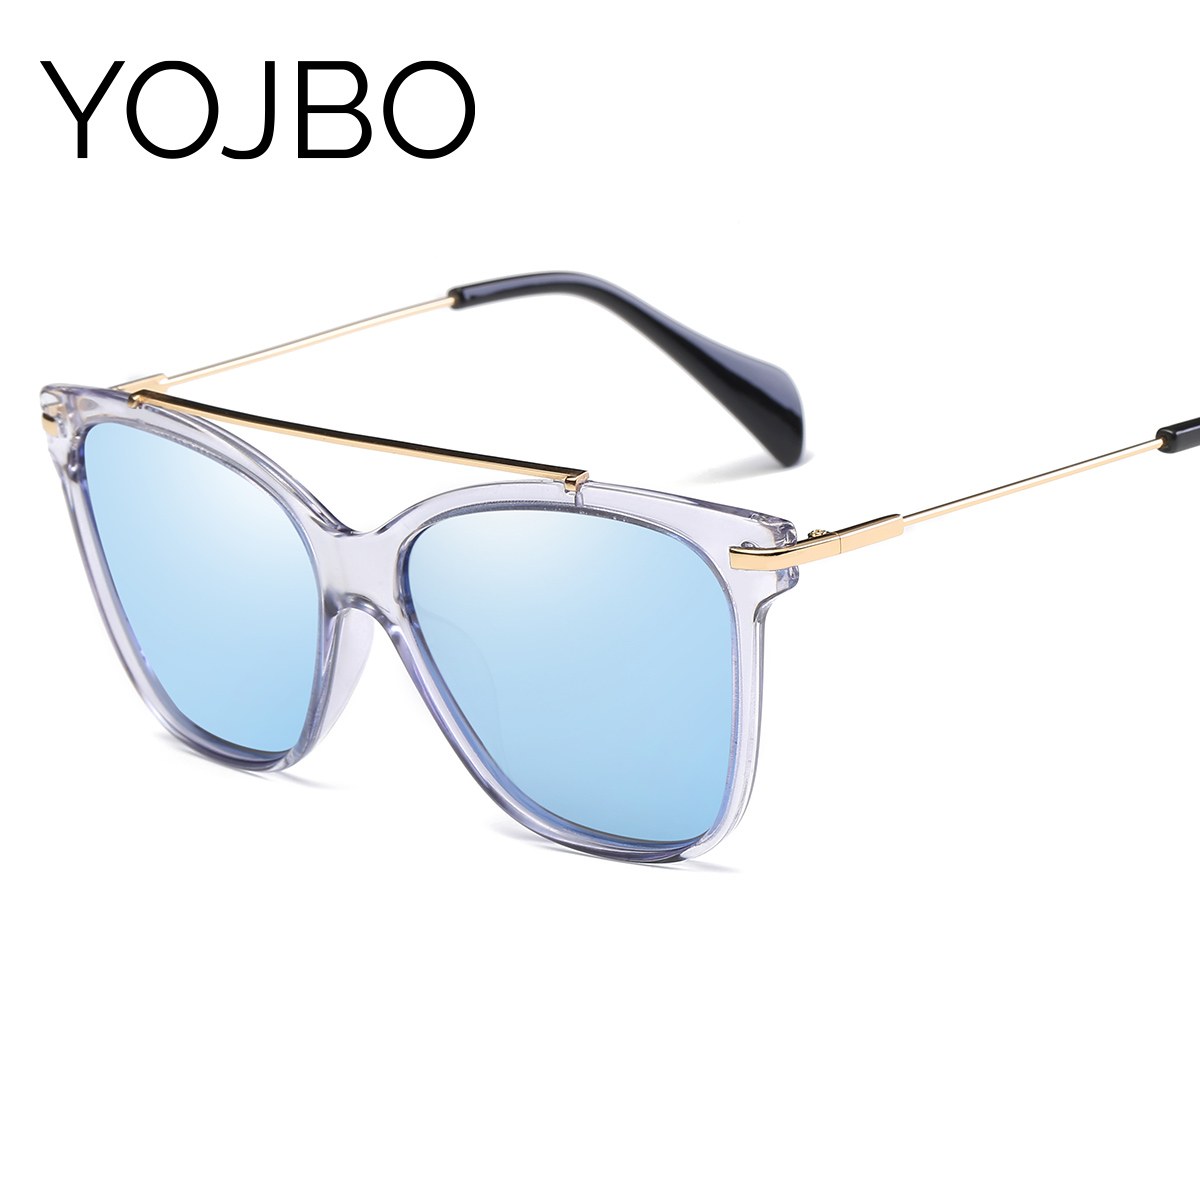 YOJBO Cat Eye Polarized Women Sunglasses 2018 Fashion Retro Mirror Sun Glasses UV400 Alloy Vintage Brand Designer Glasses